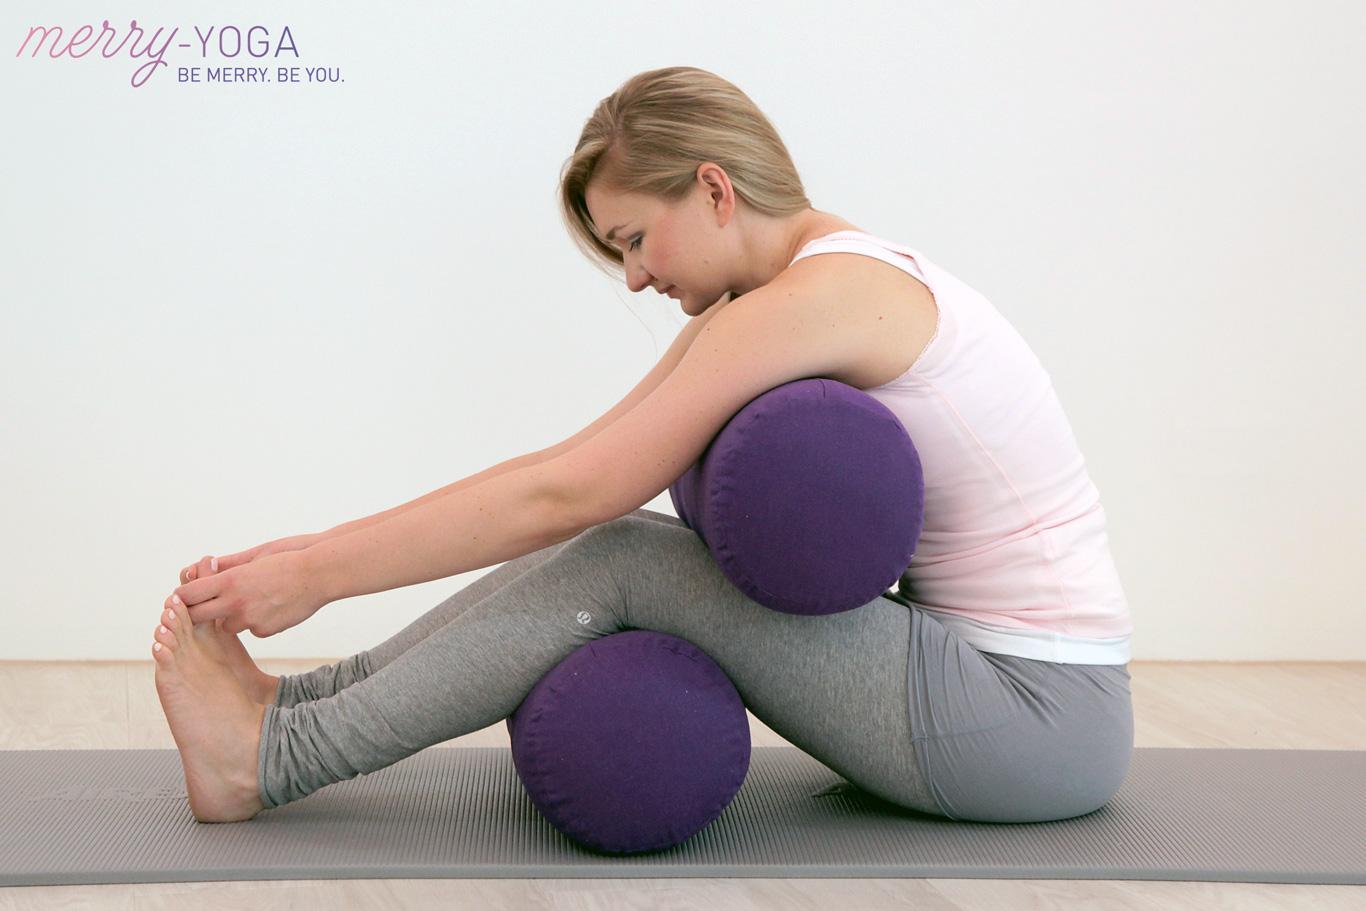 Merry-Yoga | München | Vorwärtsbeuge